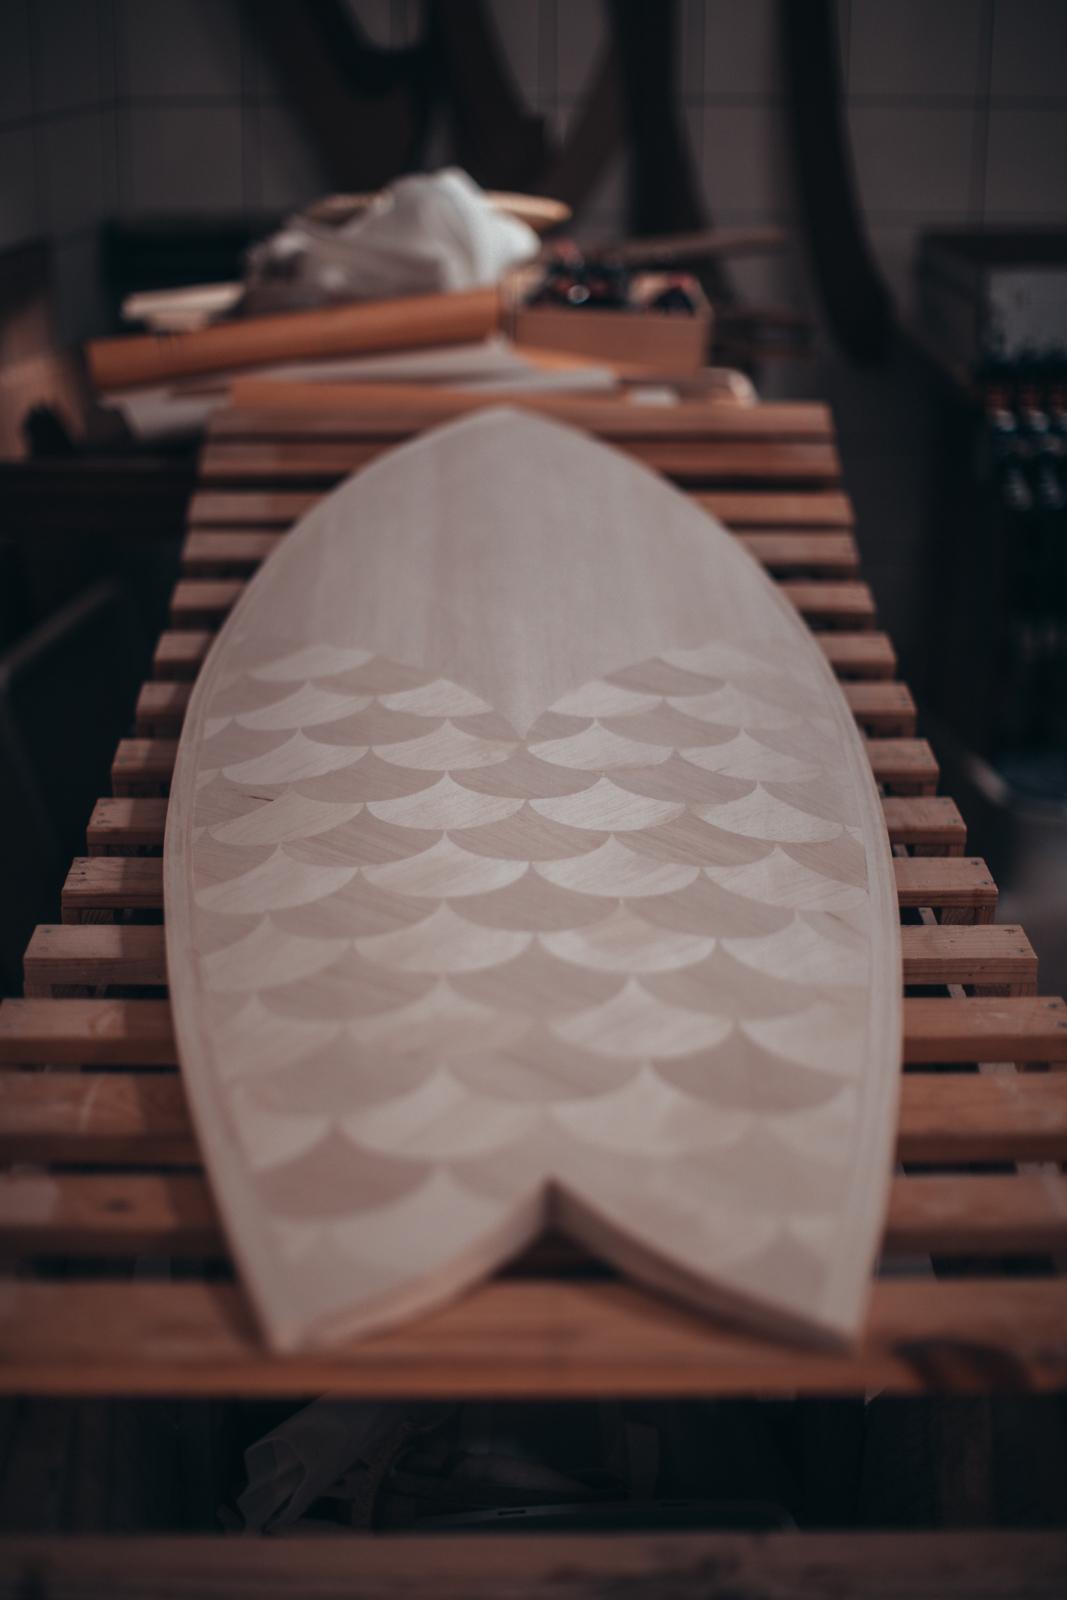 Shaper bois Cachalot Surfboards wood wooden surfboard hollow pexhon surf art